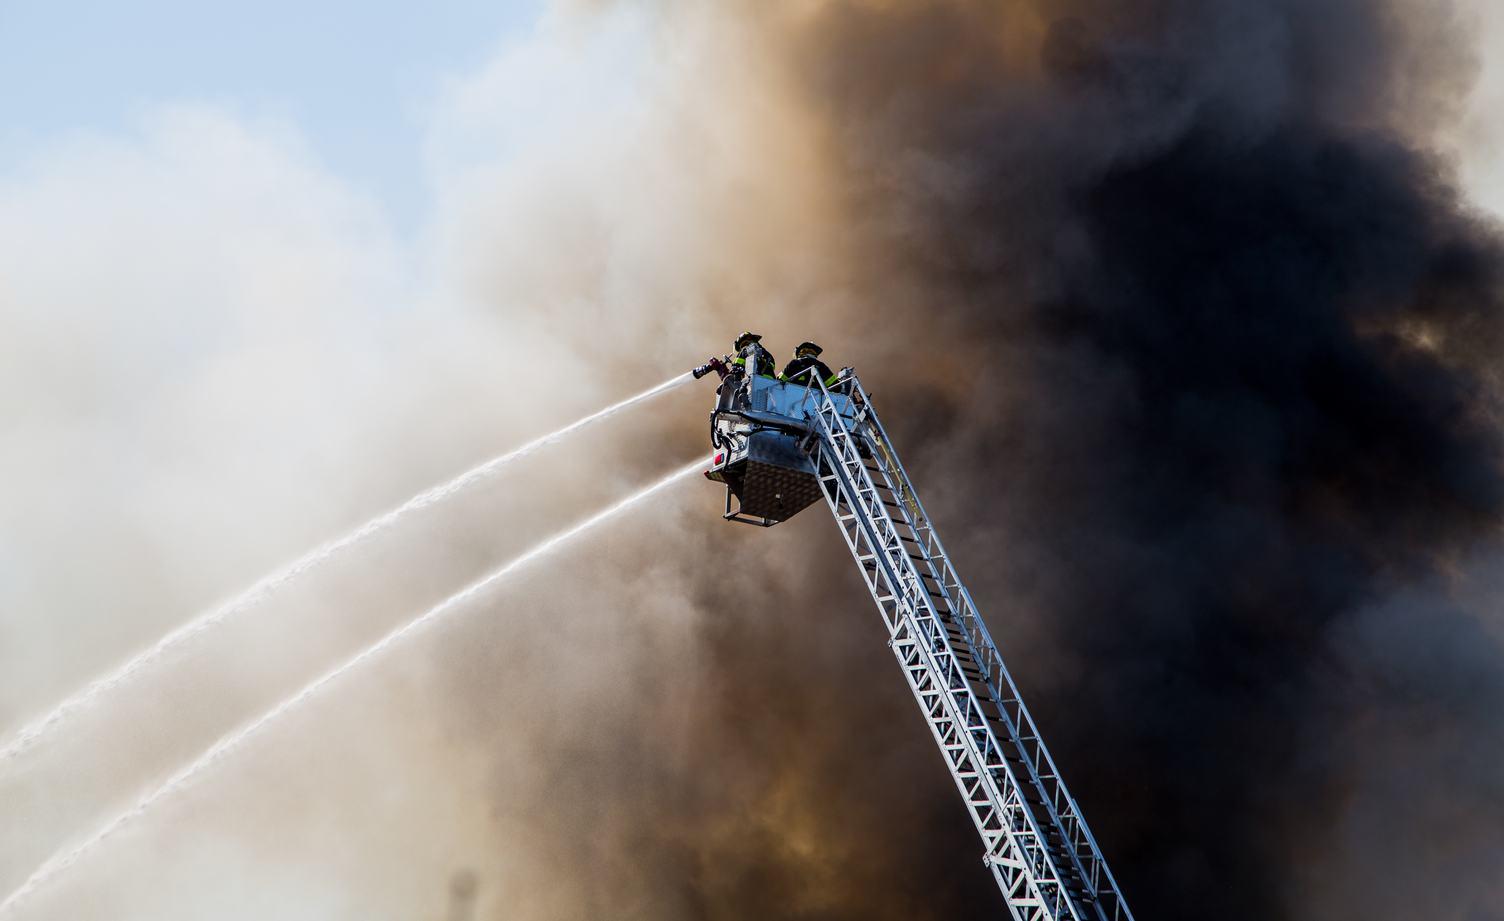 Two Firefmen on the Ladder Spray Water against Black Smoke